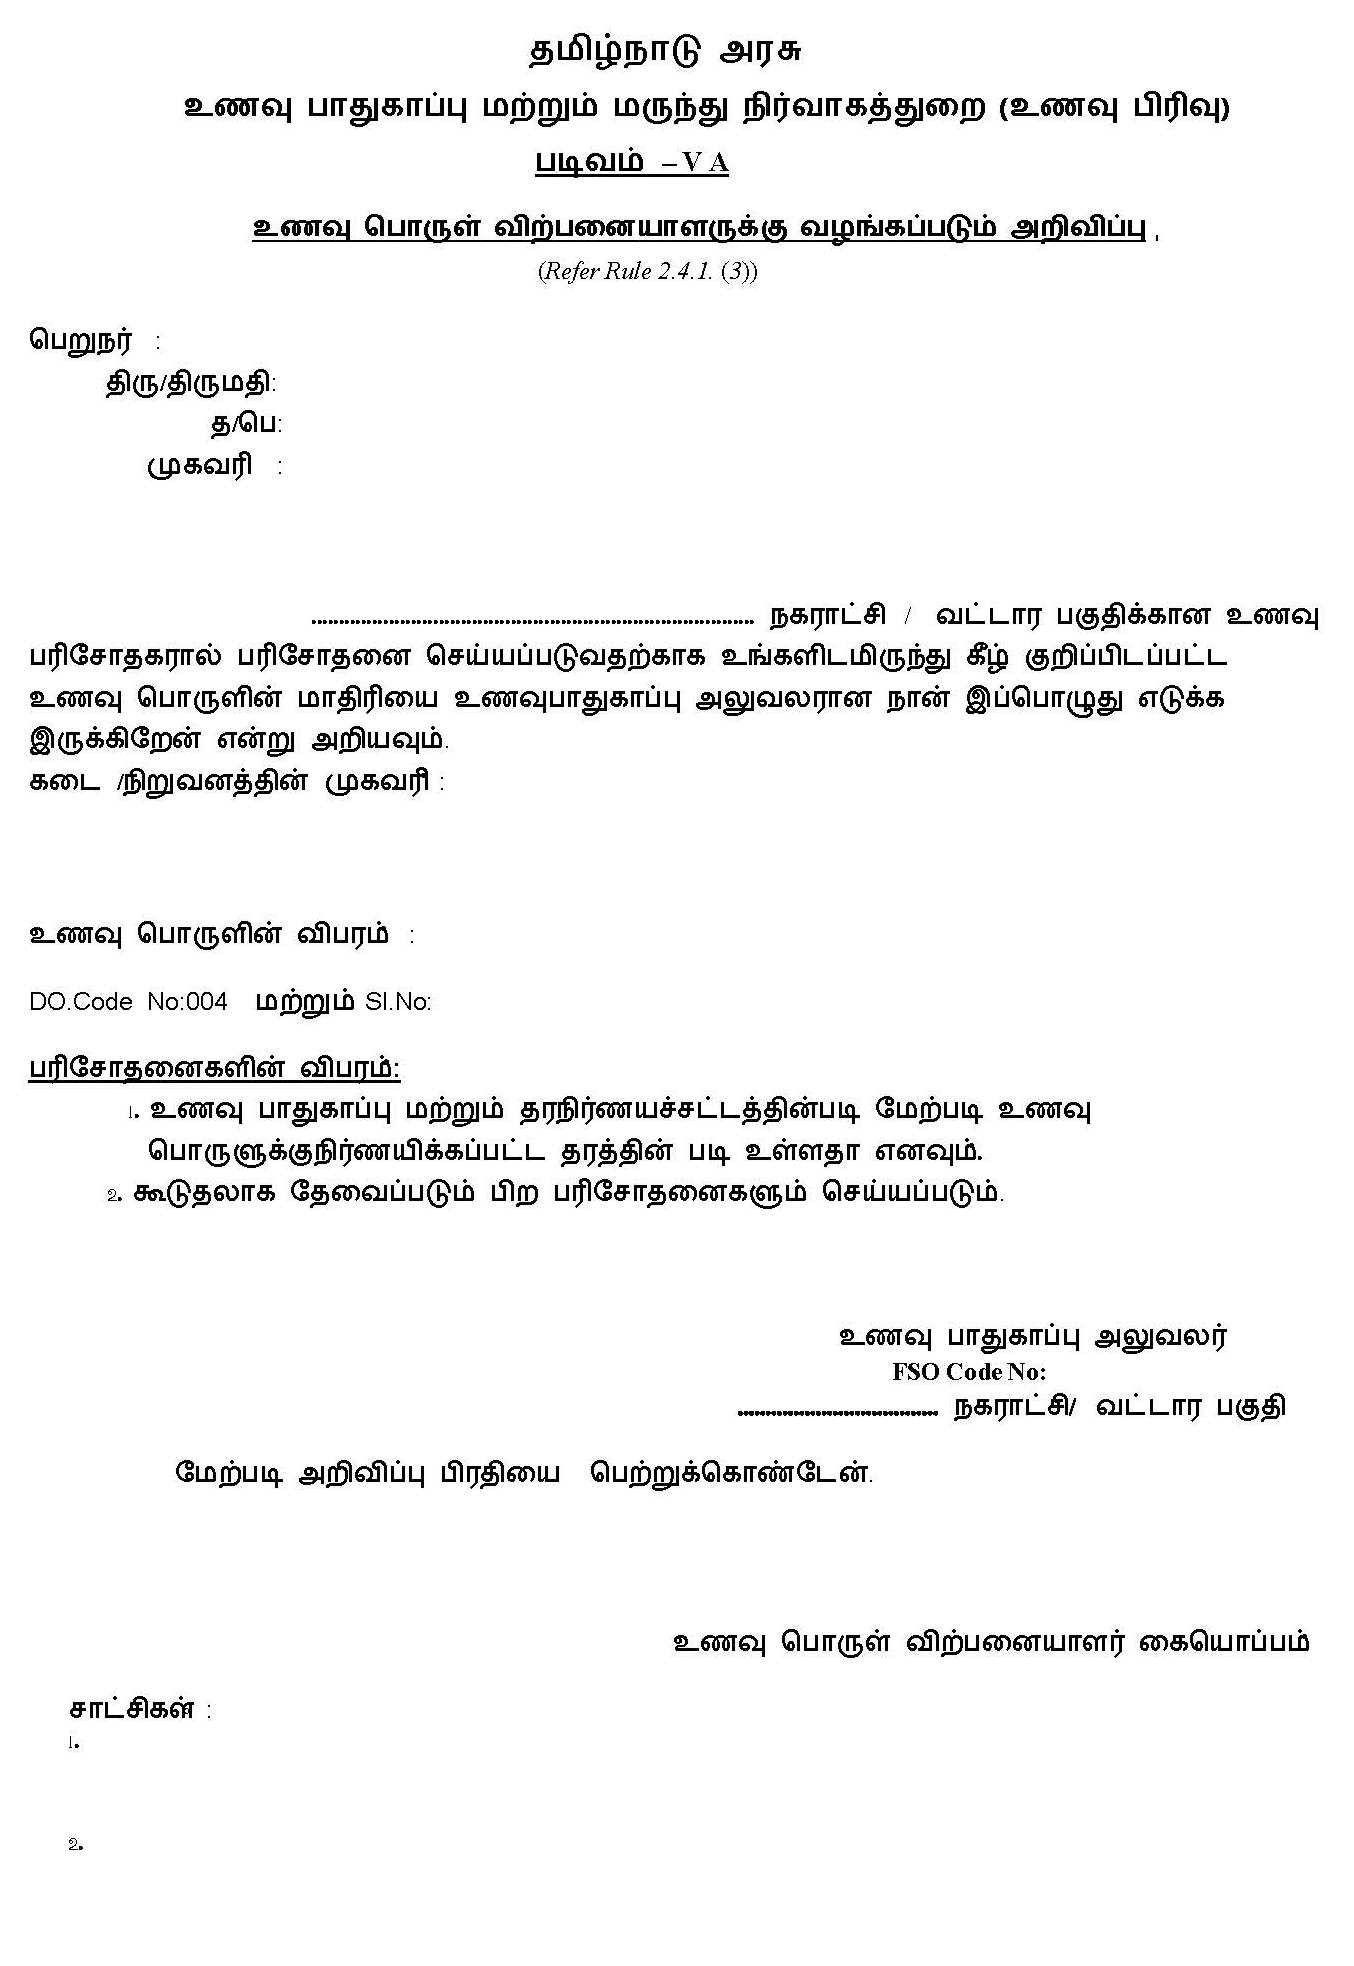 Valid Formative Letter In Hindi Language Hindi Language Letter Format Sample Lettering